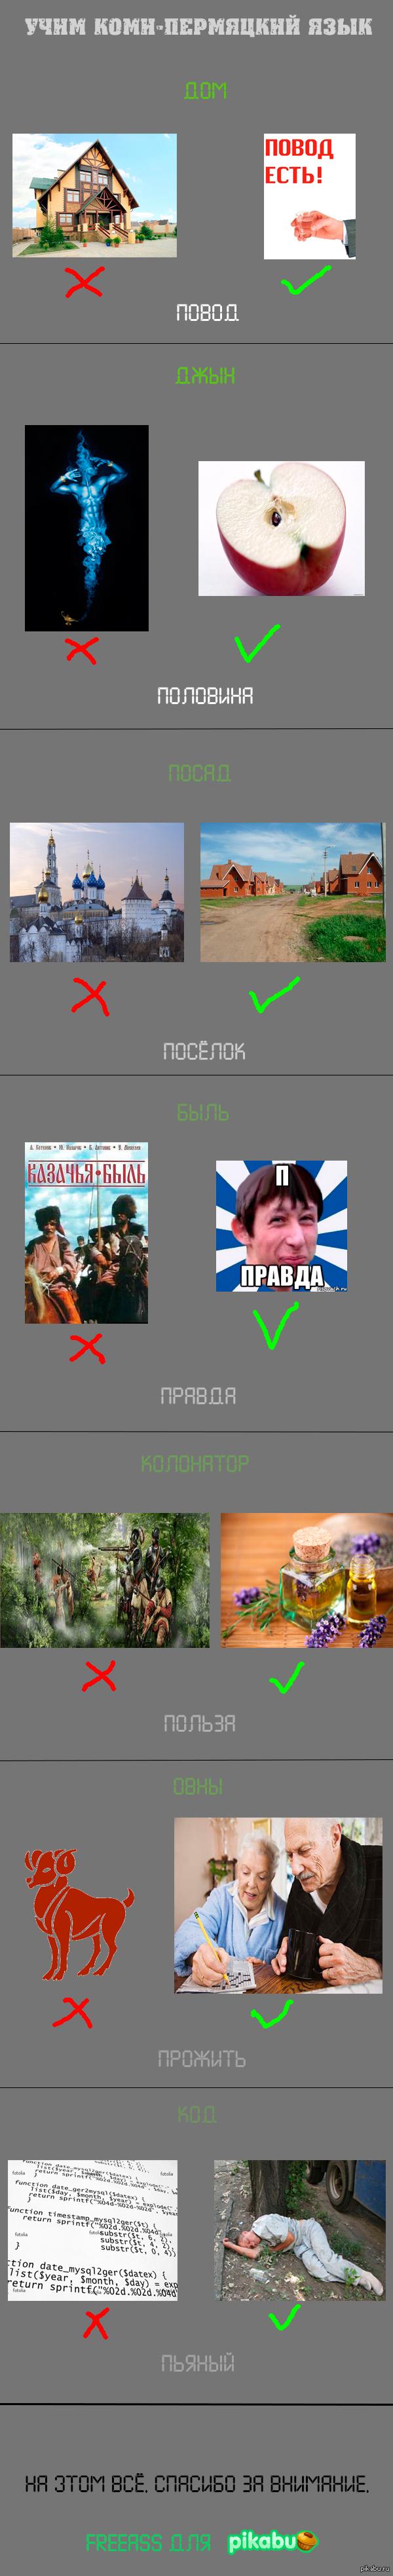 Учим коми-пермяцкий язык